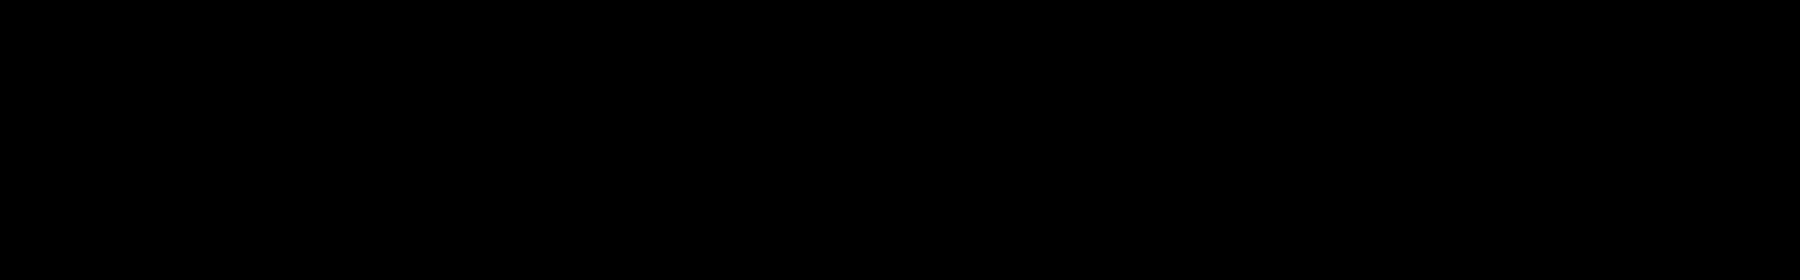 Planet X audio waveform